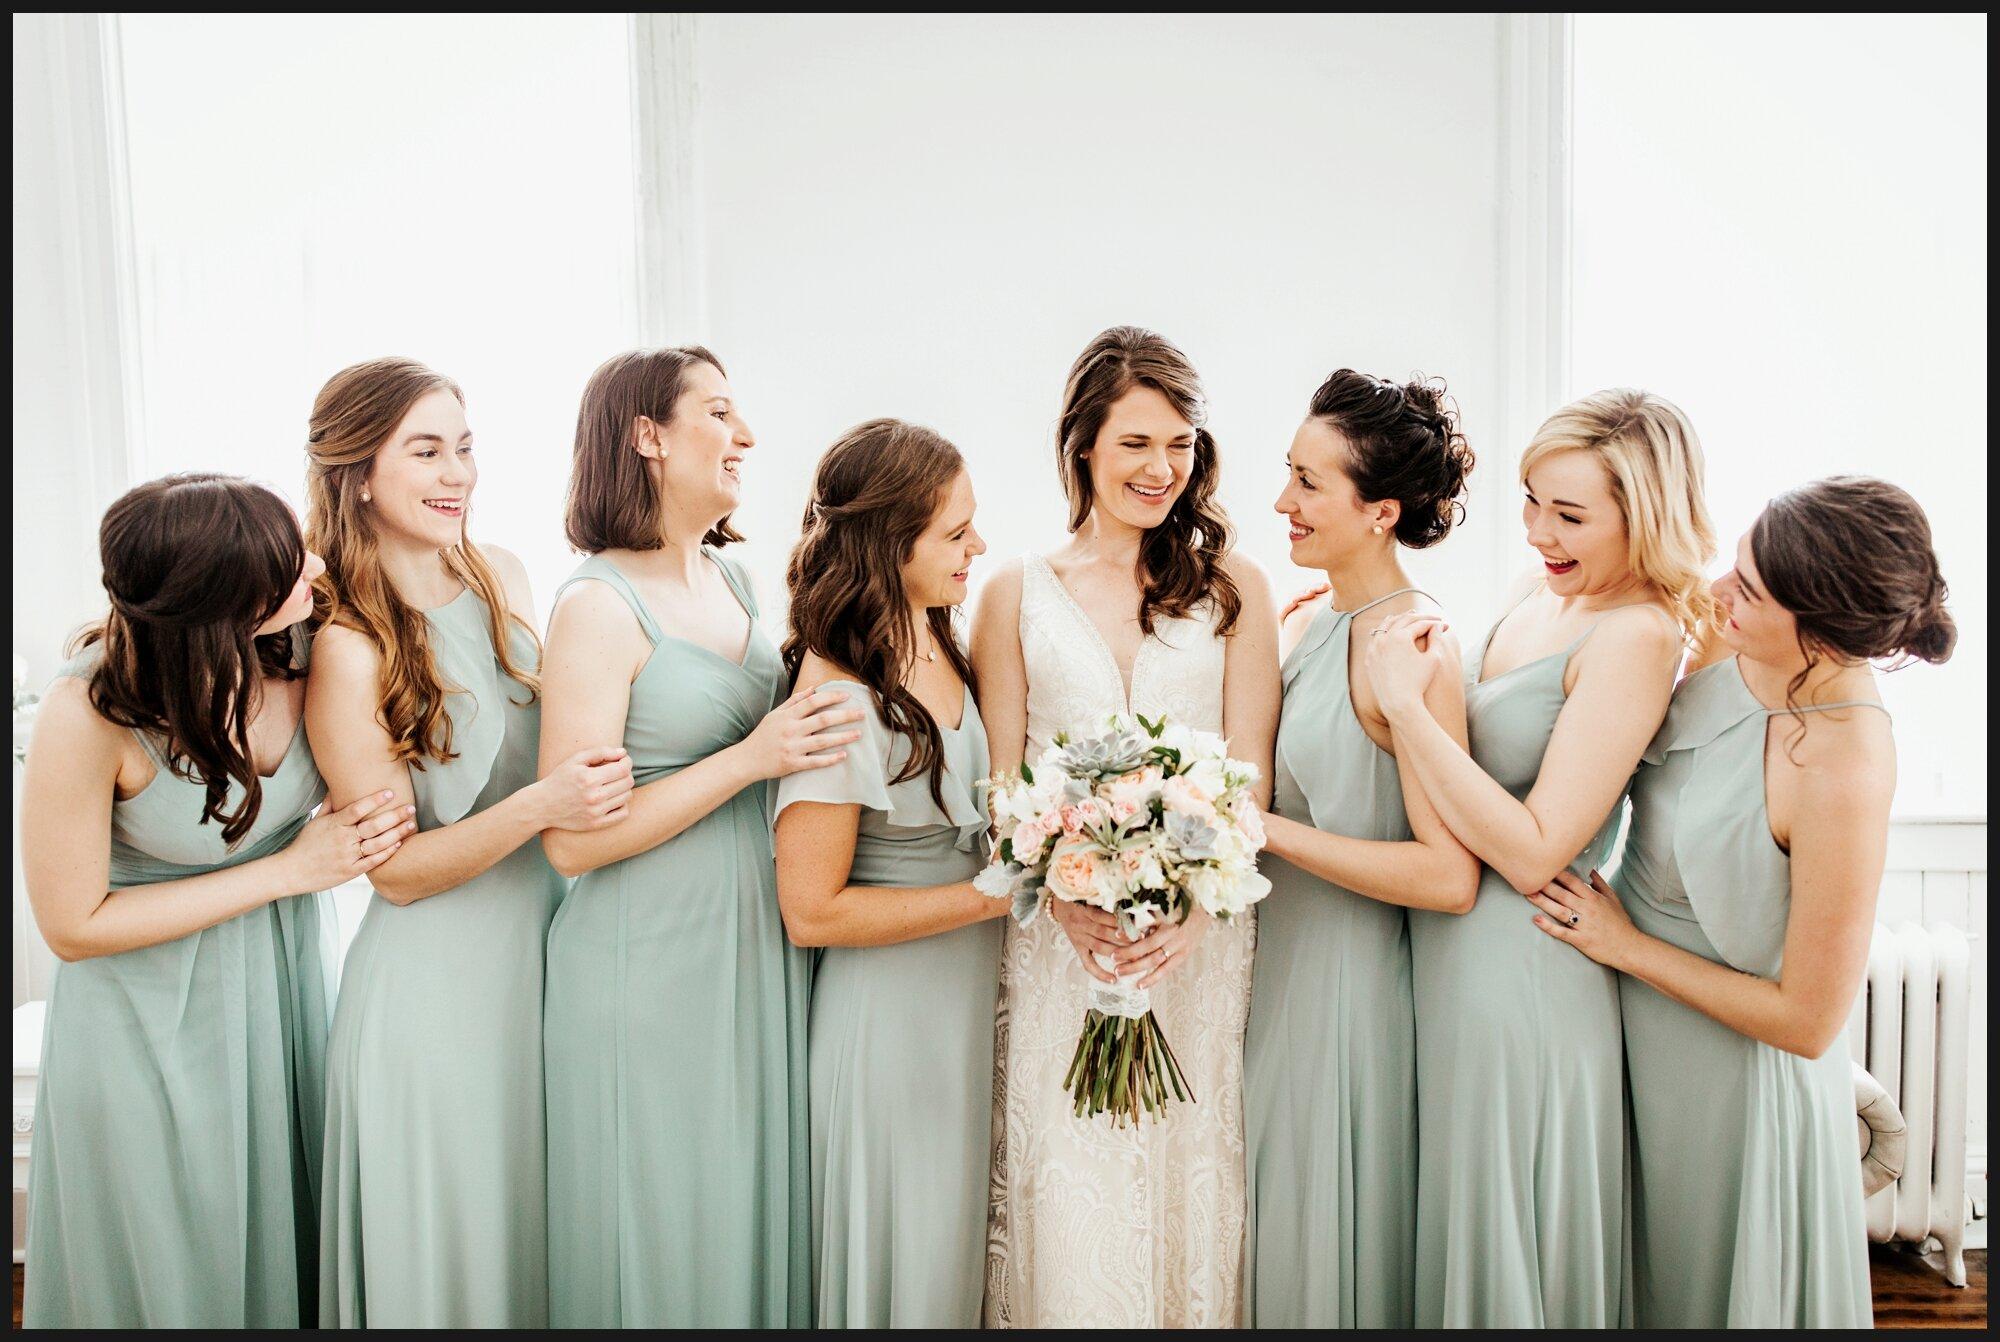 Orlando-Wedding-Photographer-destination-wedding-photographer-florida-wedding-photographer-hawaii-wedding-photographer_0657.jpg